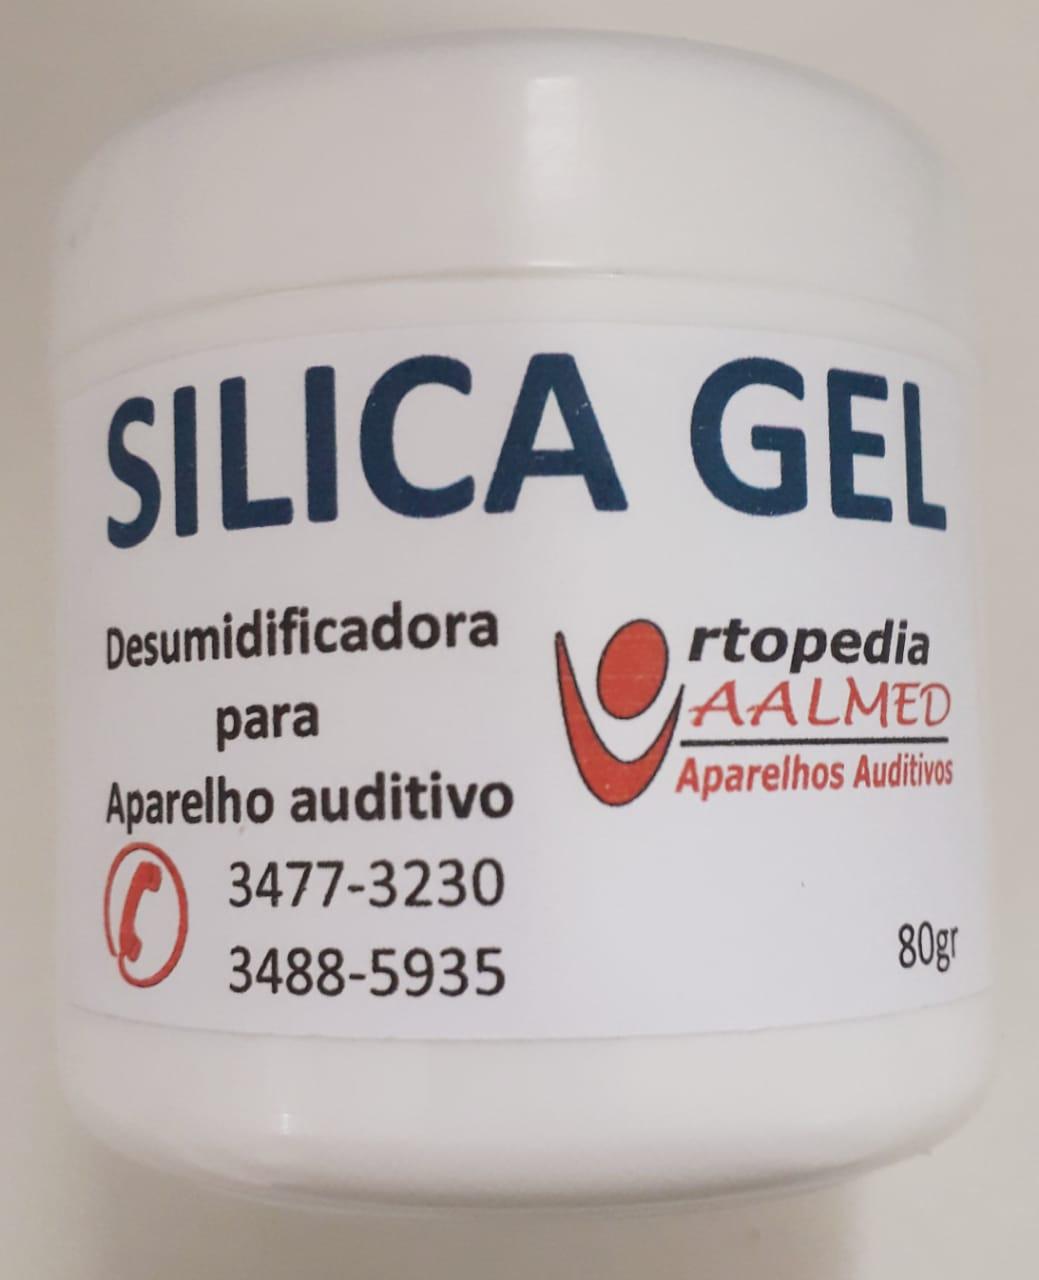 SILICA GEL DESUMIDIFICADORA PARA APARELHO AUDITIVO